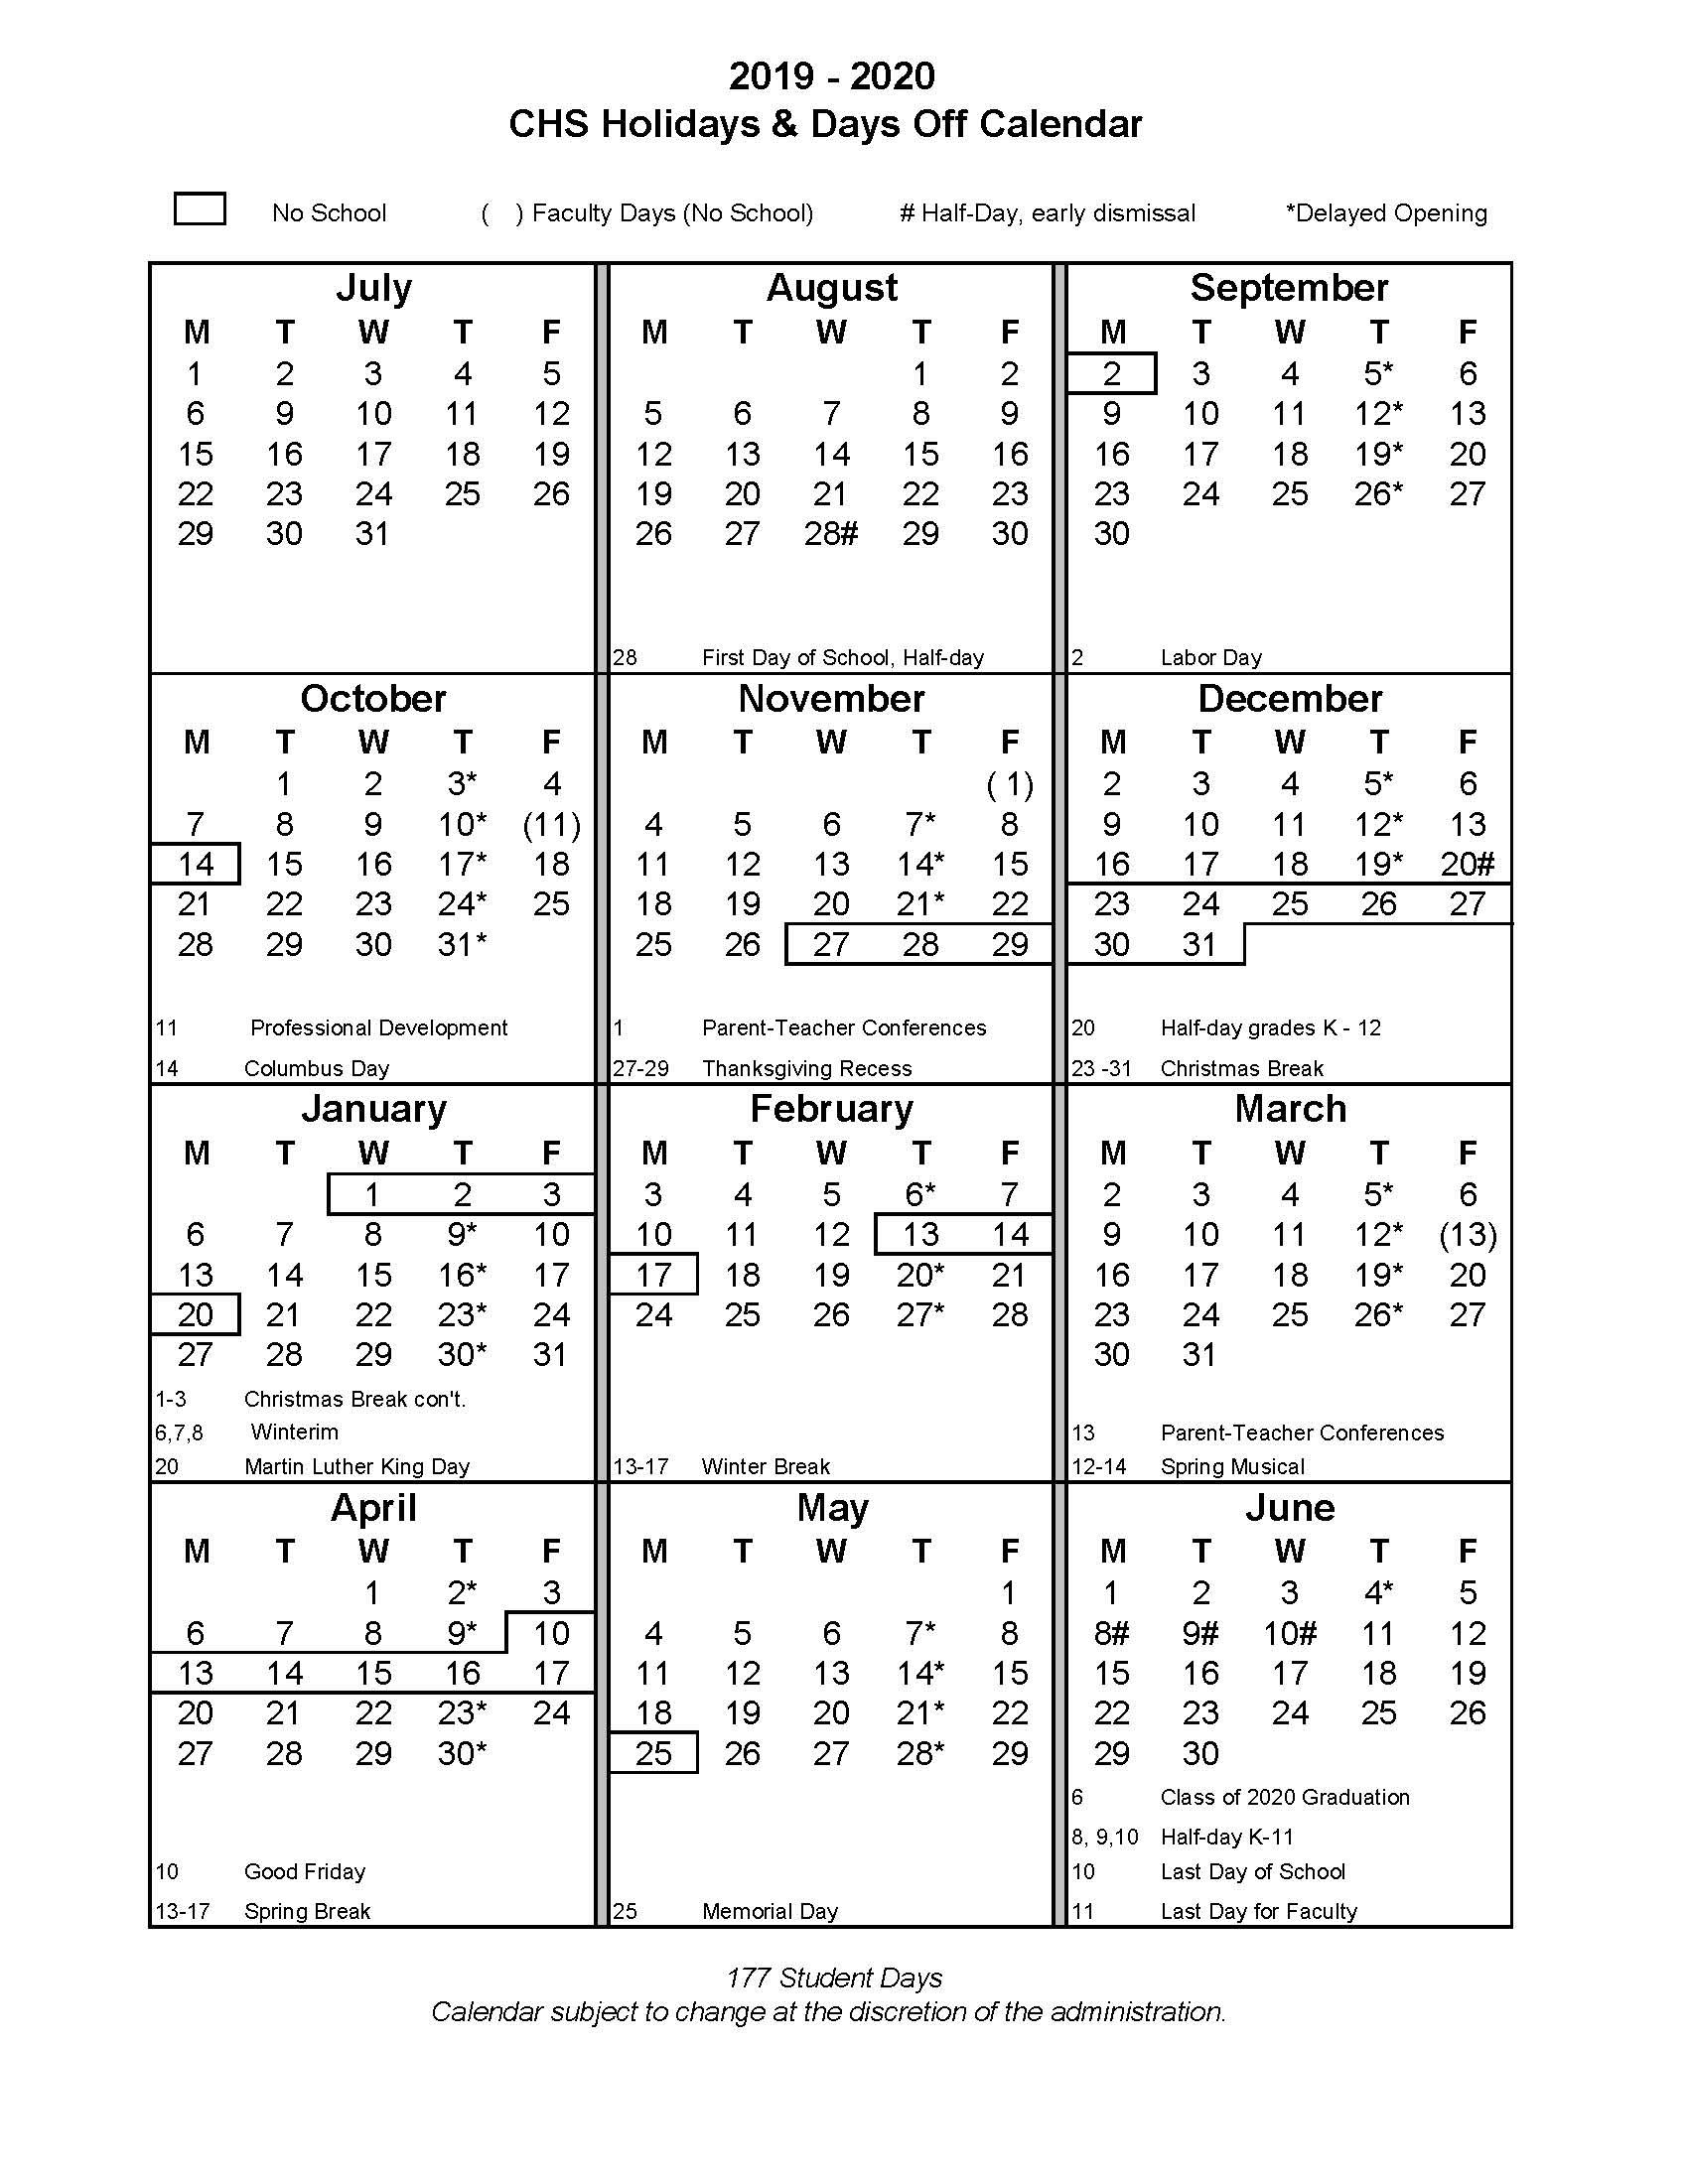 201920 School Year  Christian Heritage School with regard to Trumbull School Calendar